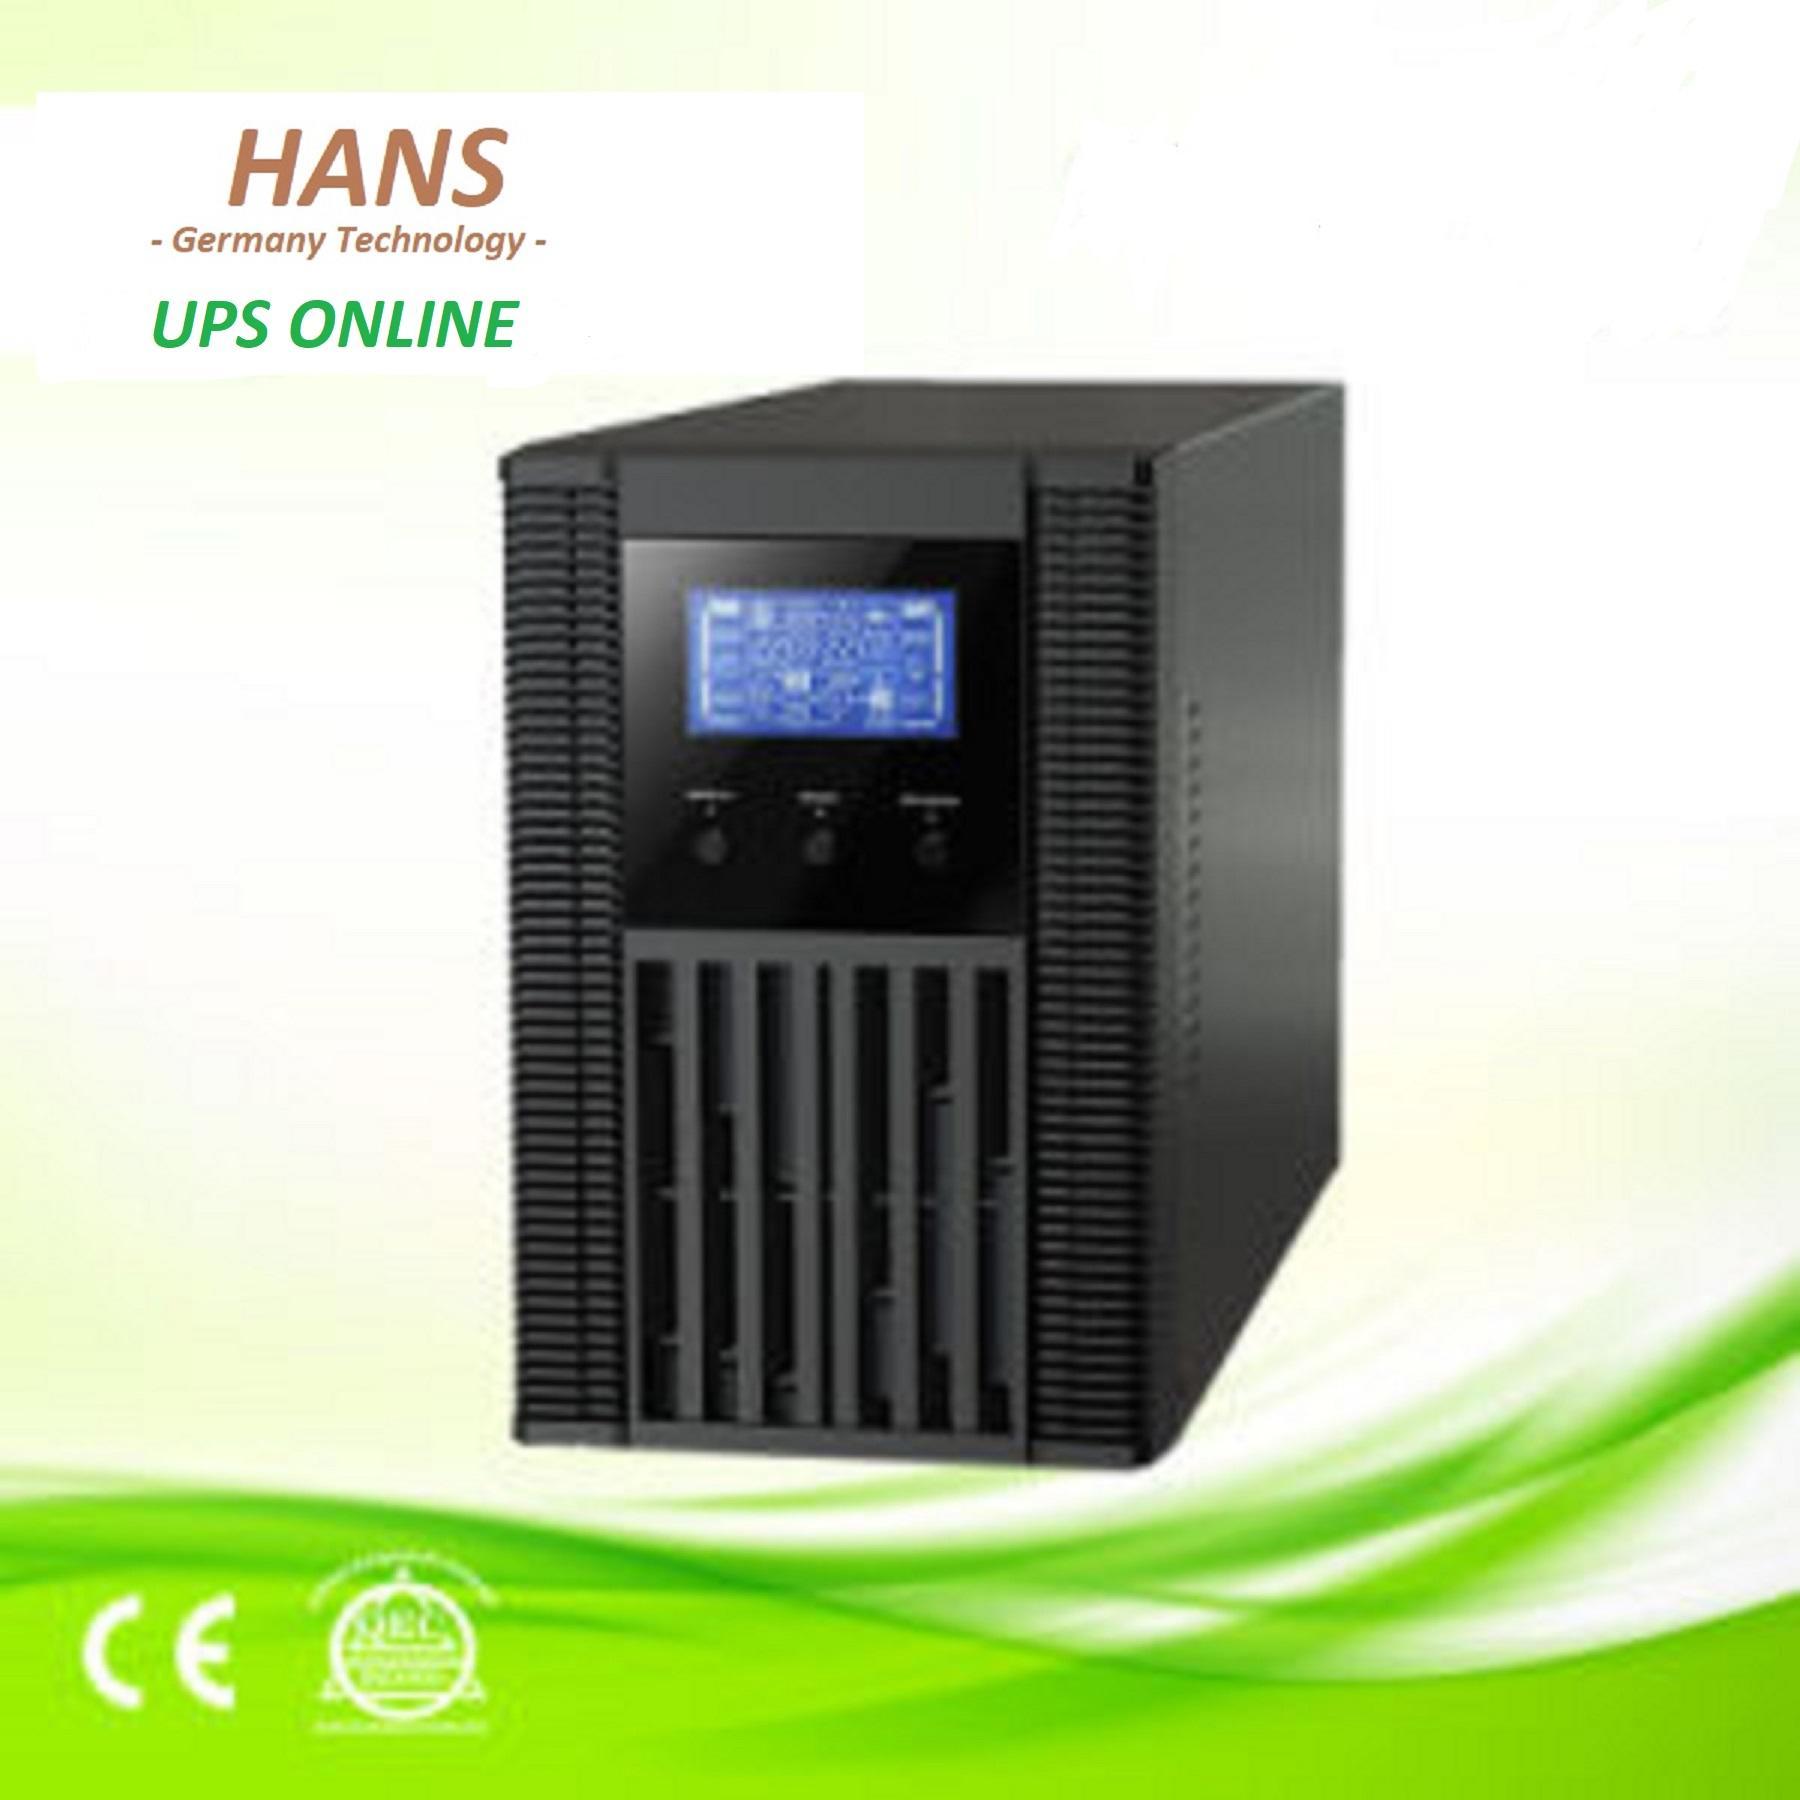 Bộ lưu điện online Hans 3KVA